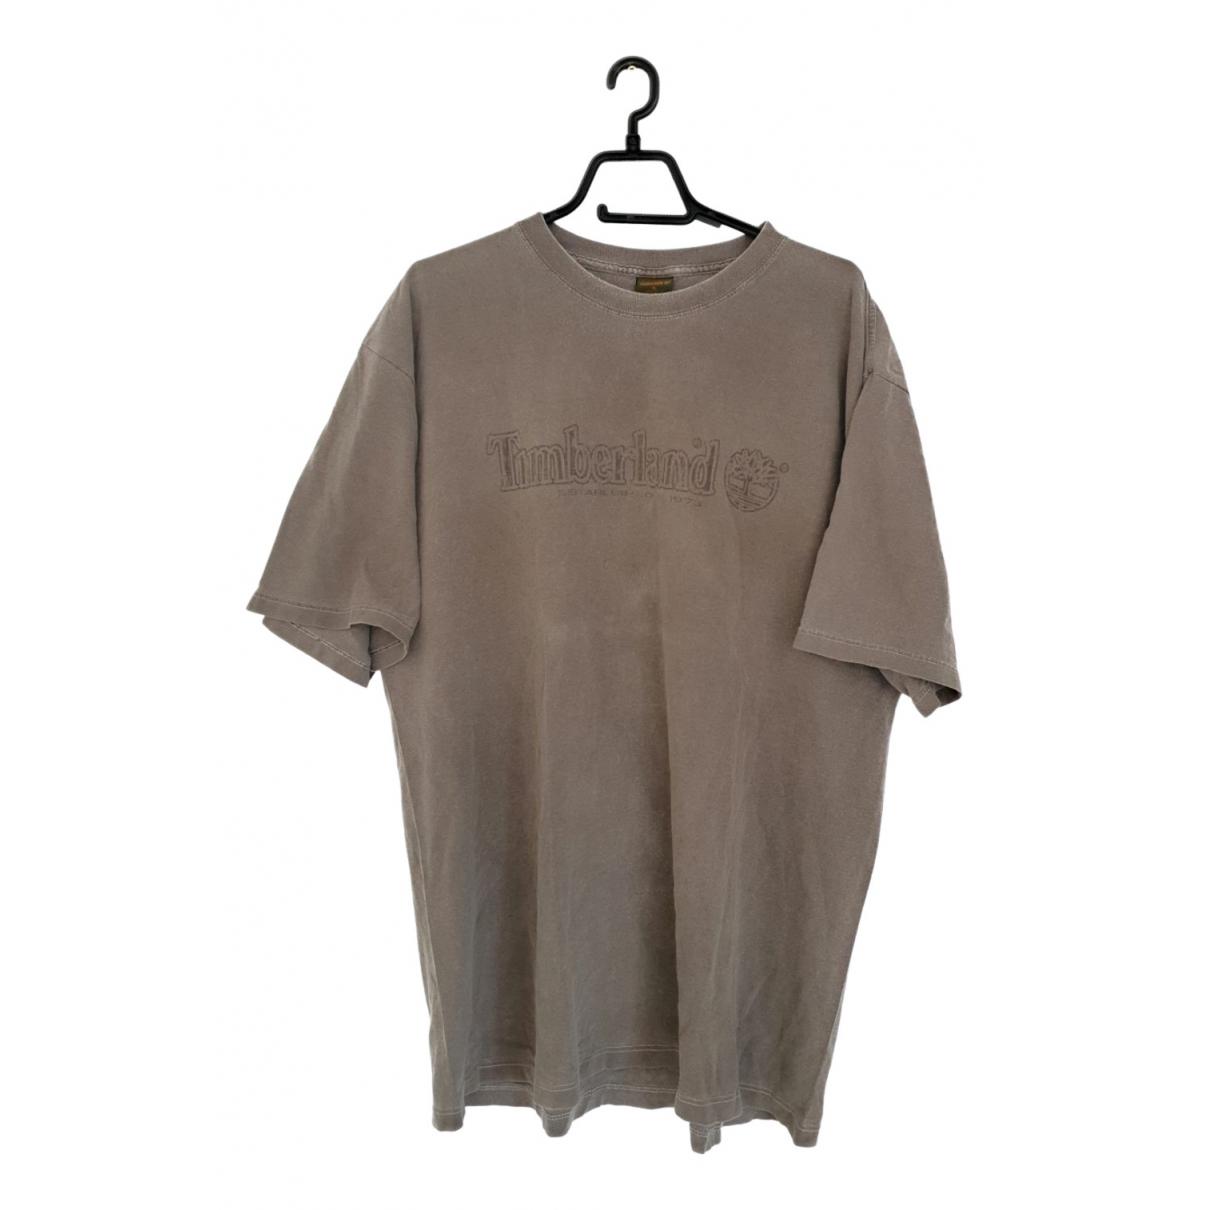 Timberland - Tee shirts   pour homme en coton - gris